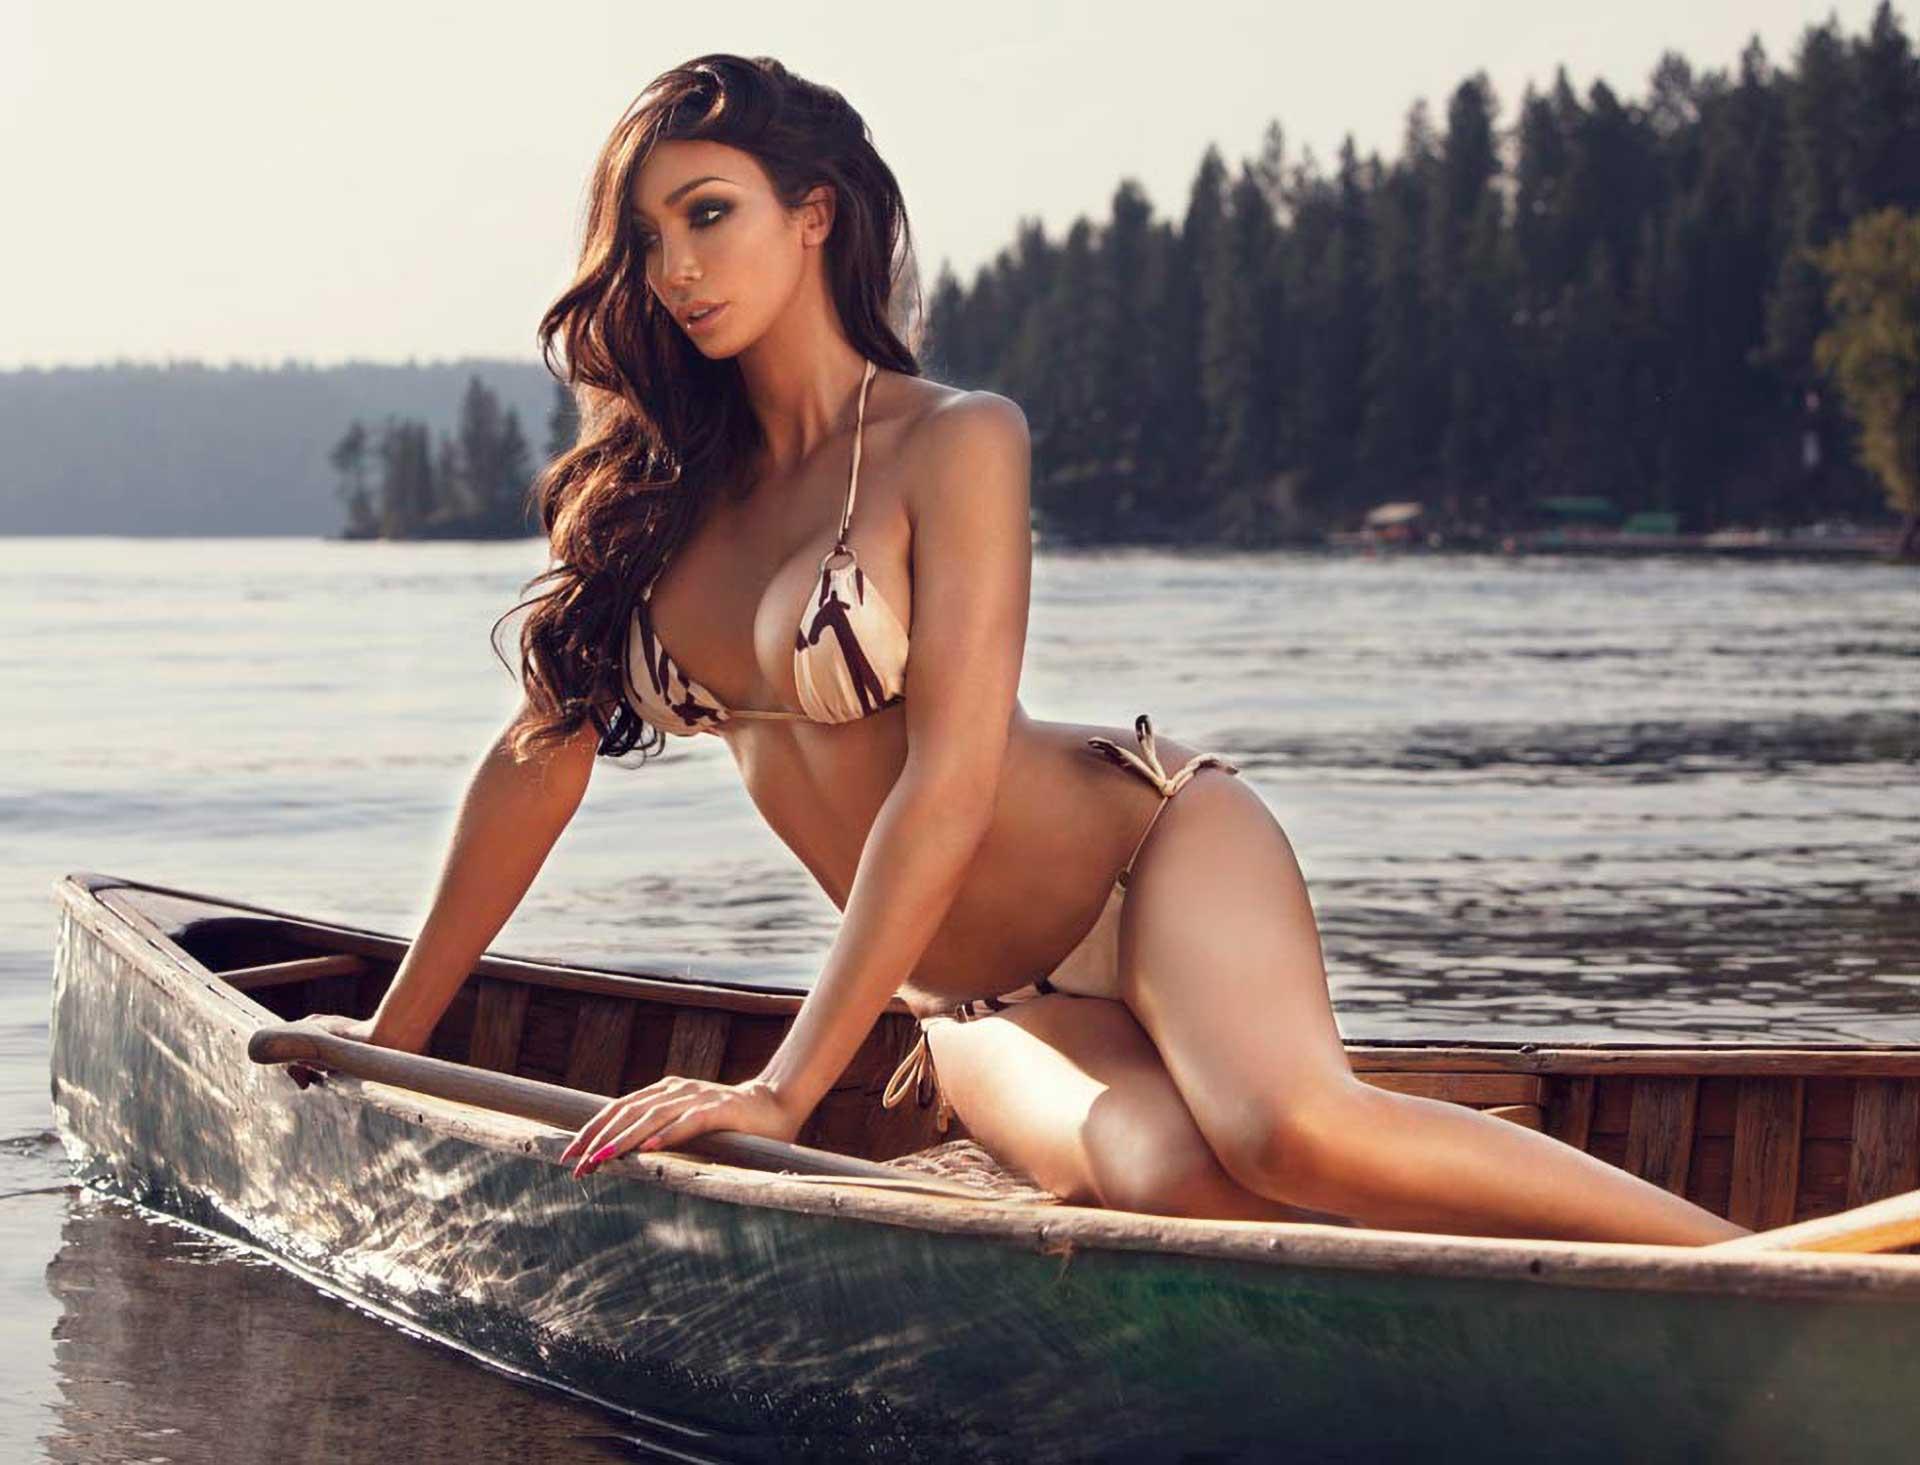 Inspirational Transgender Model Yasmine Petty